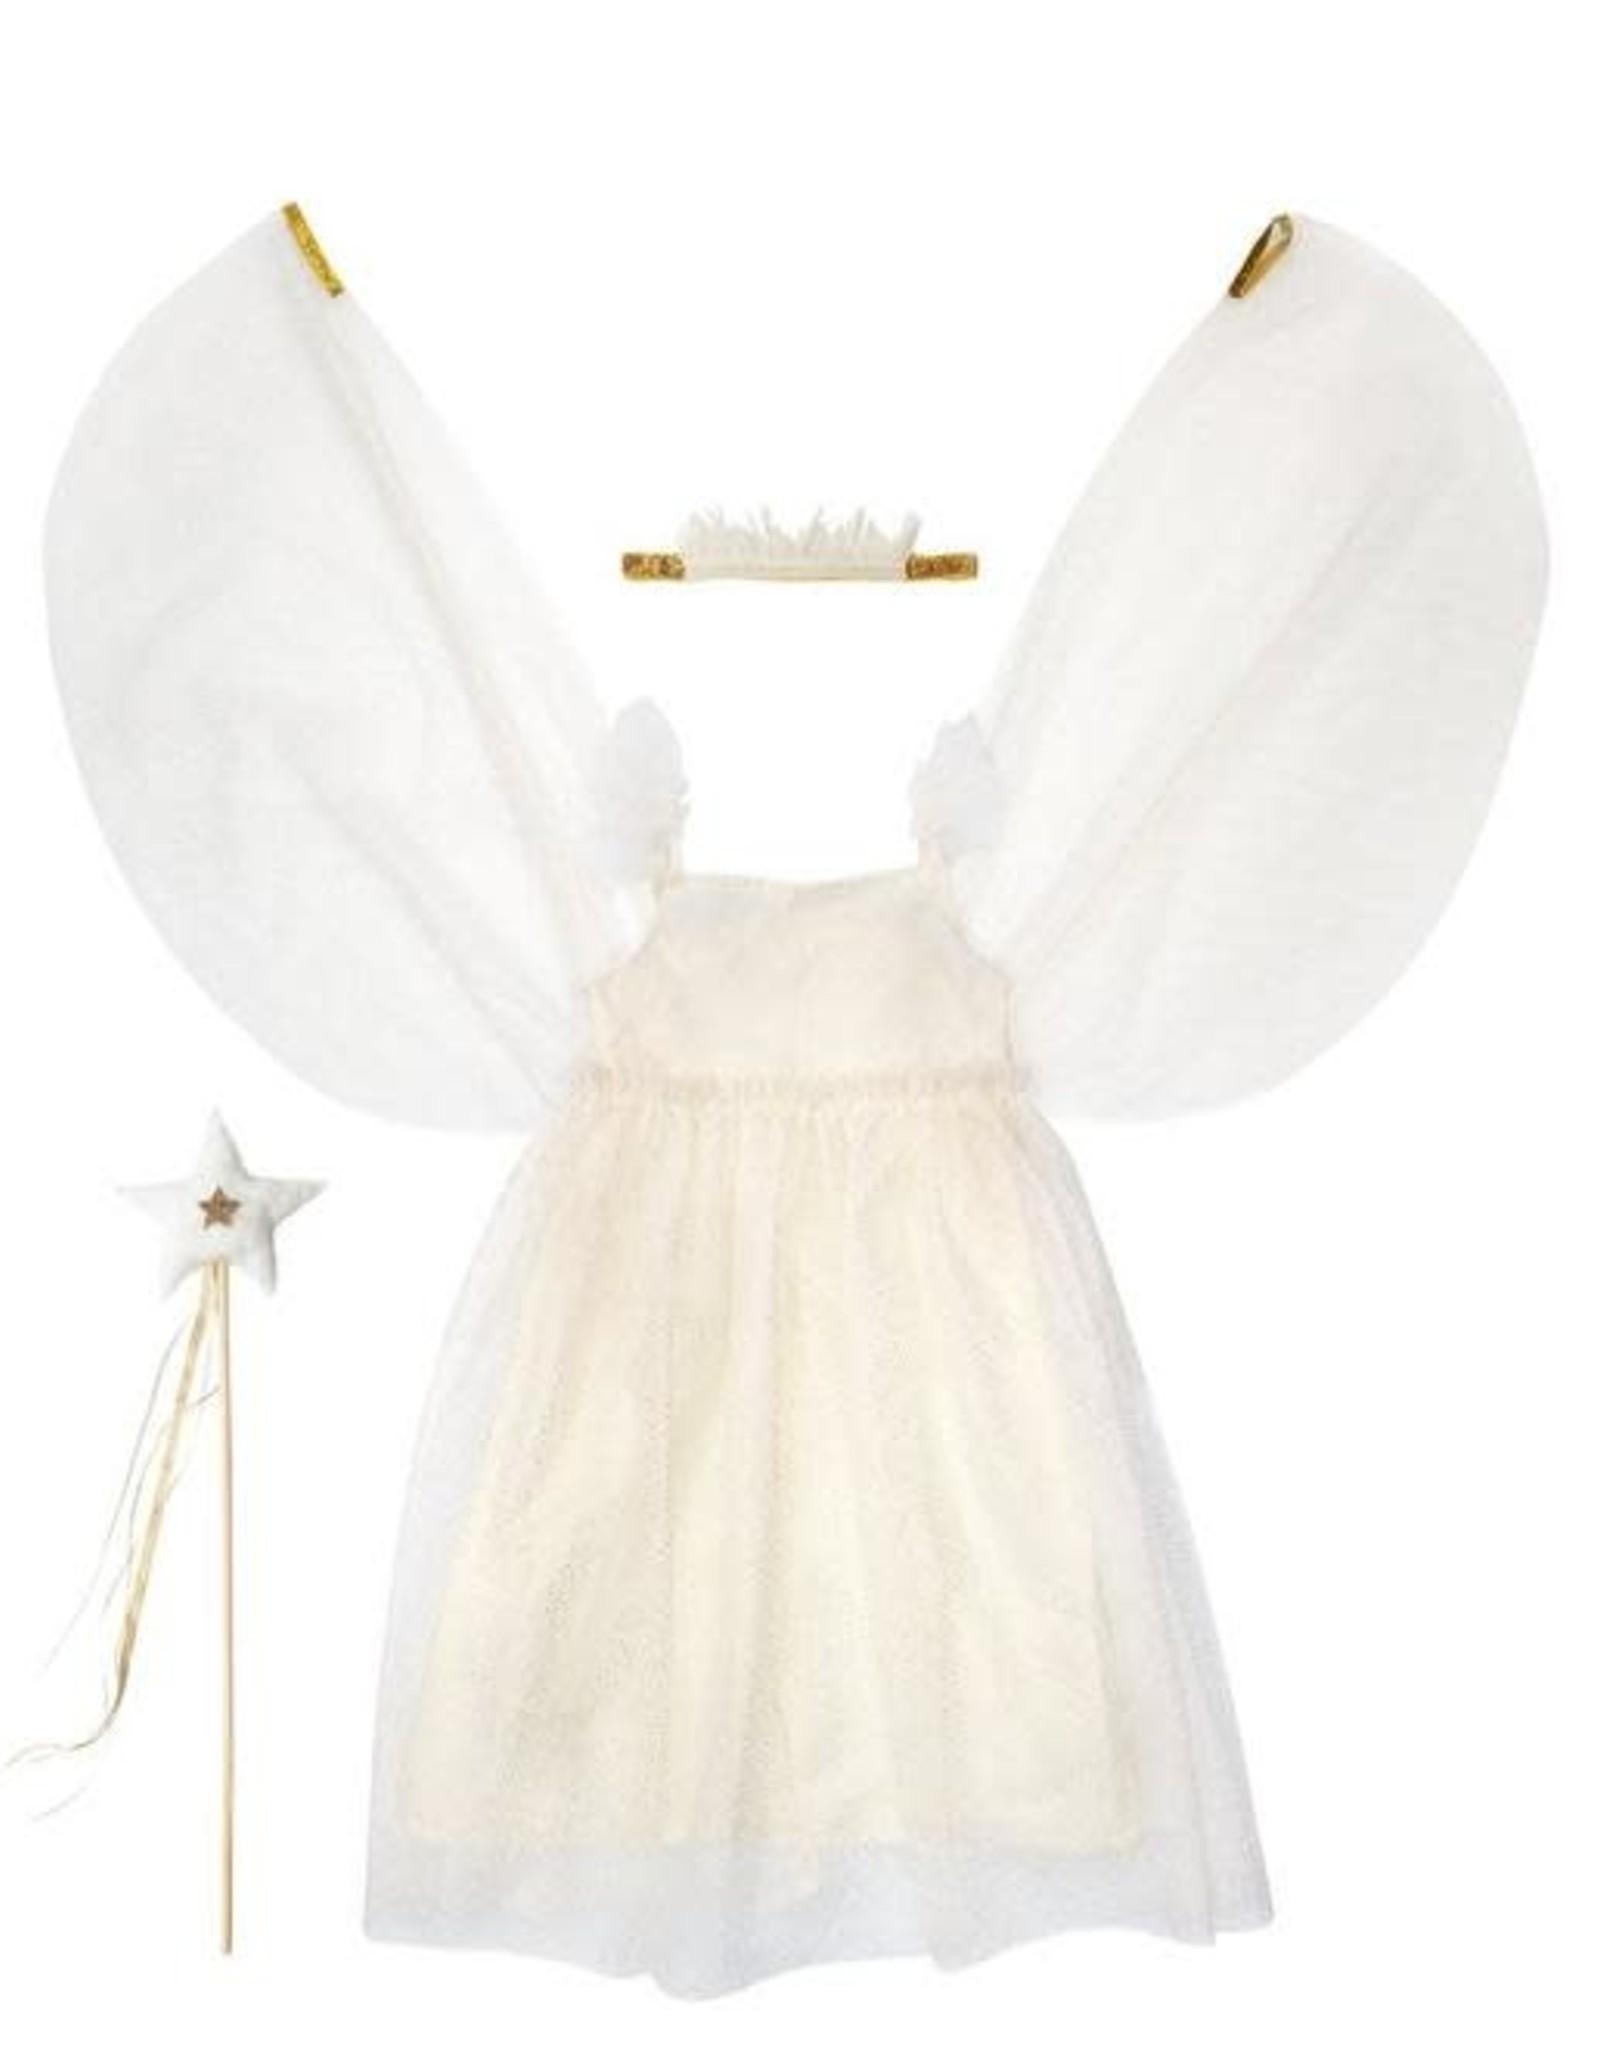 Meri Meri White Tulle Fairy Dress Up 5-6 Years